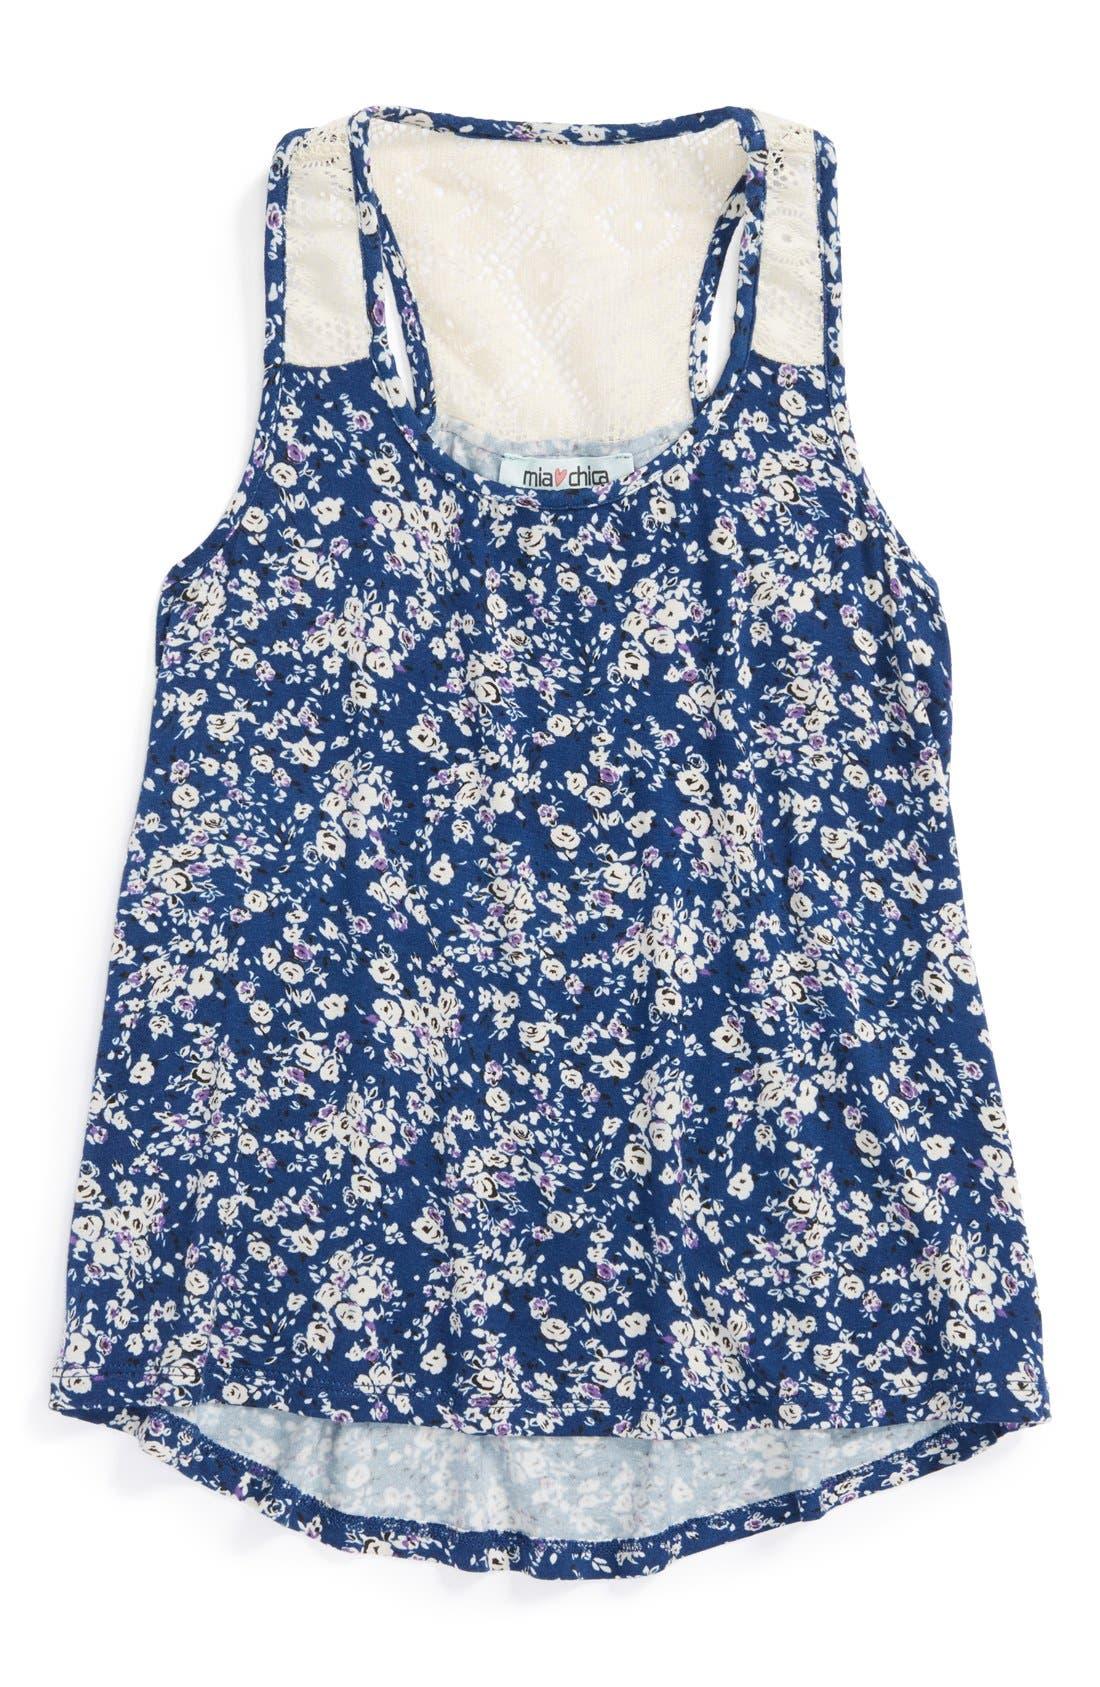 Alternate Image 1 Selected - Mia Chica Crochet Tank (Big Girls)